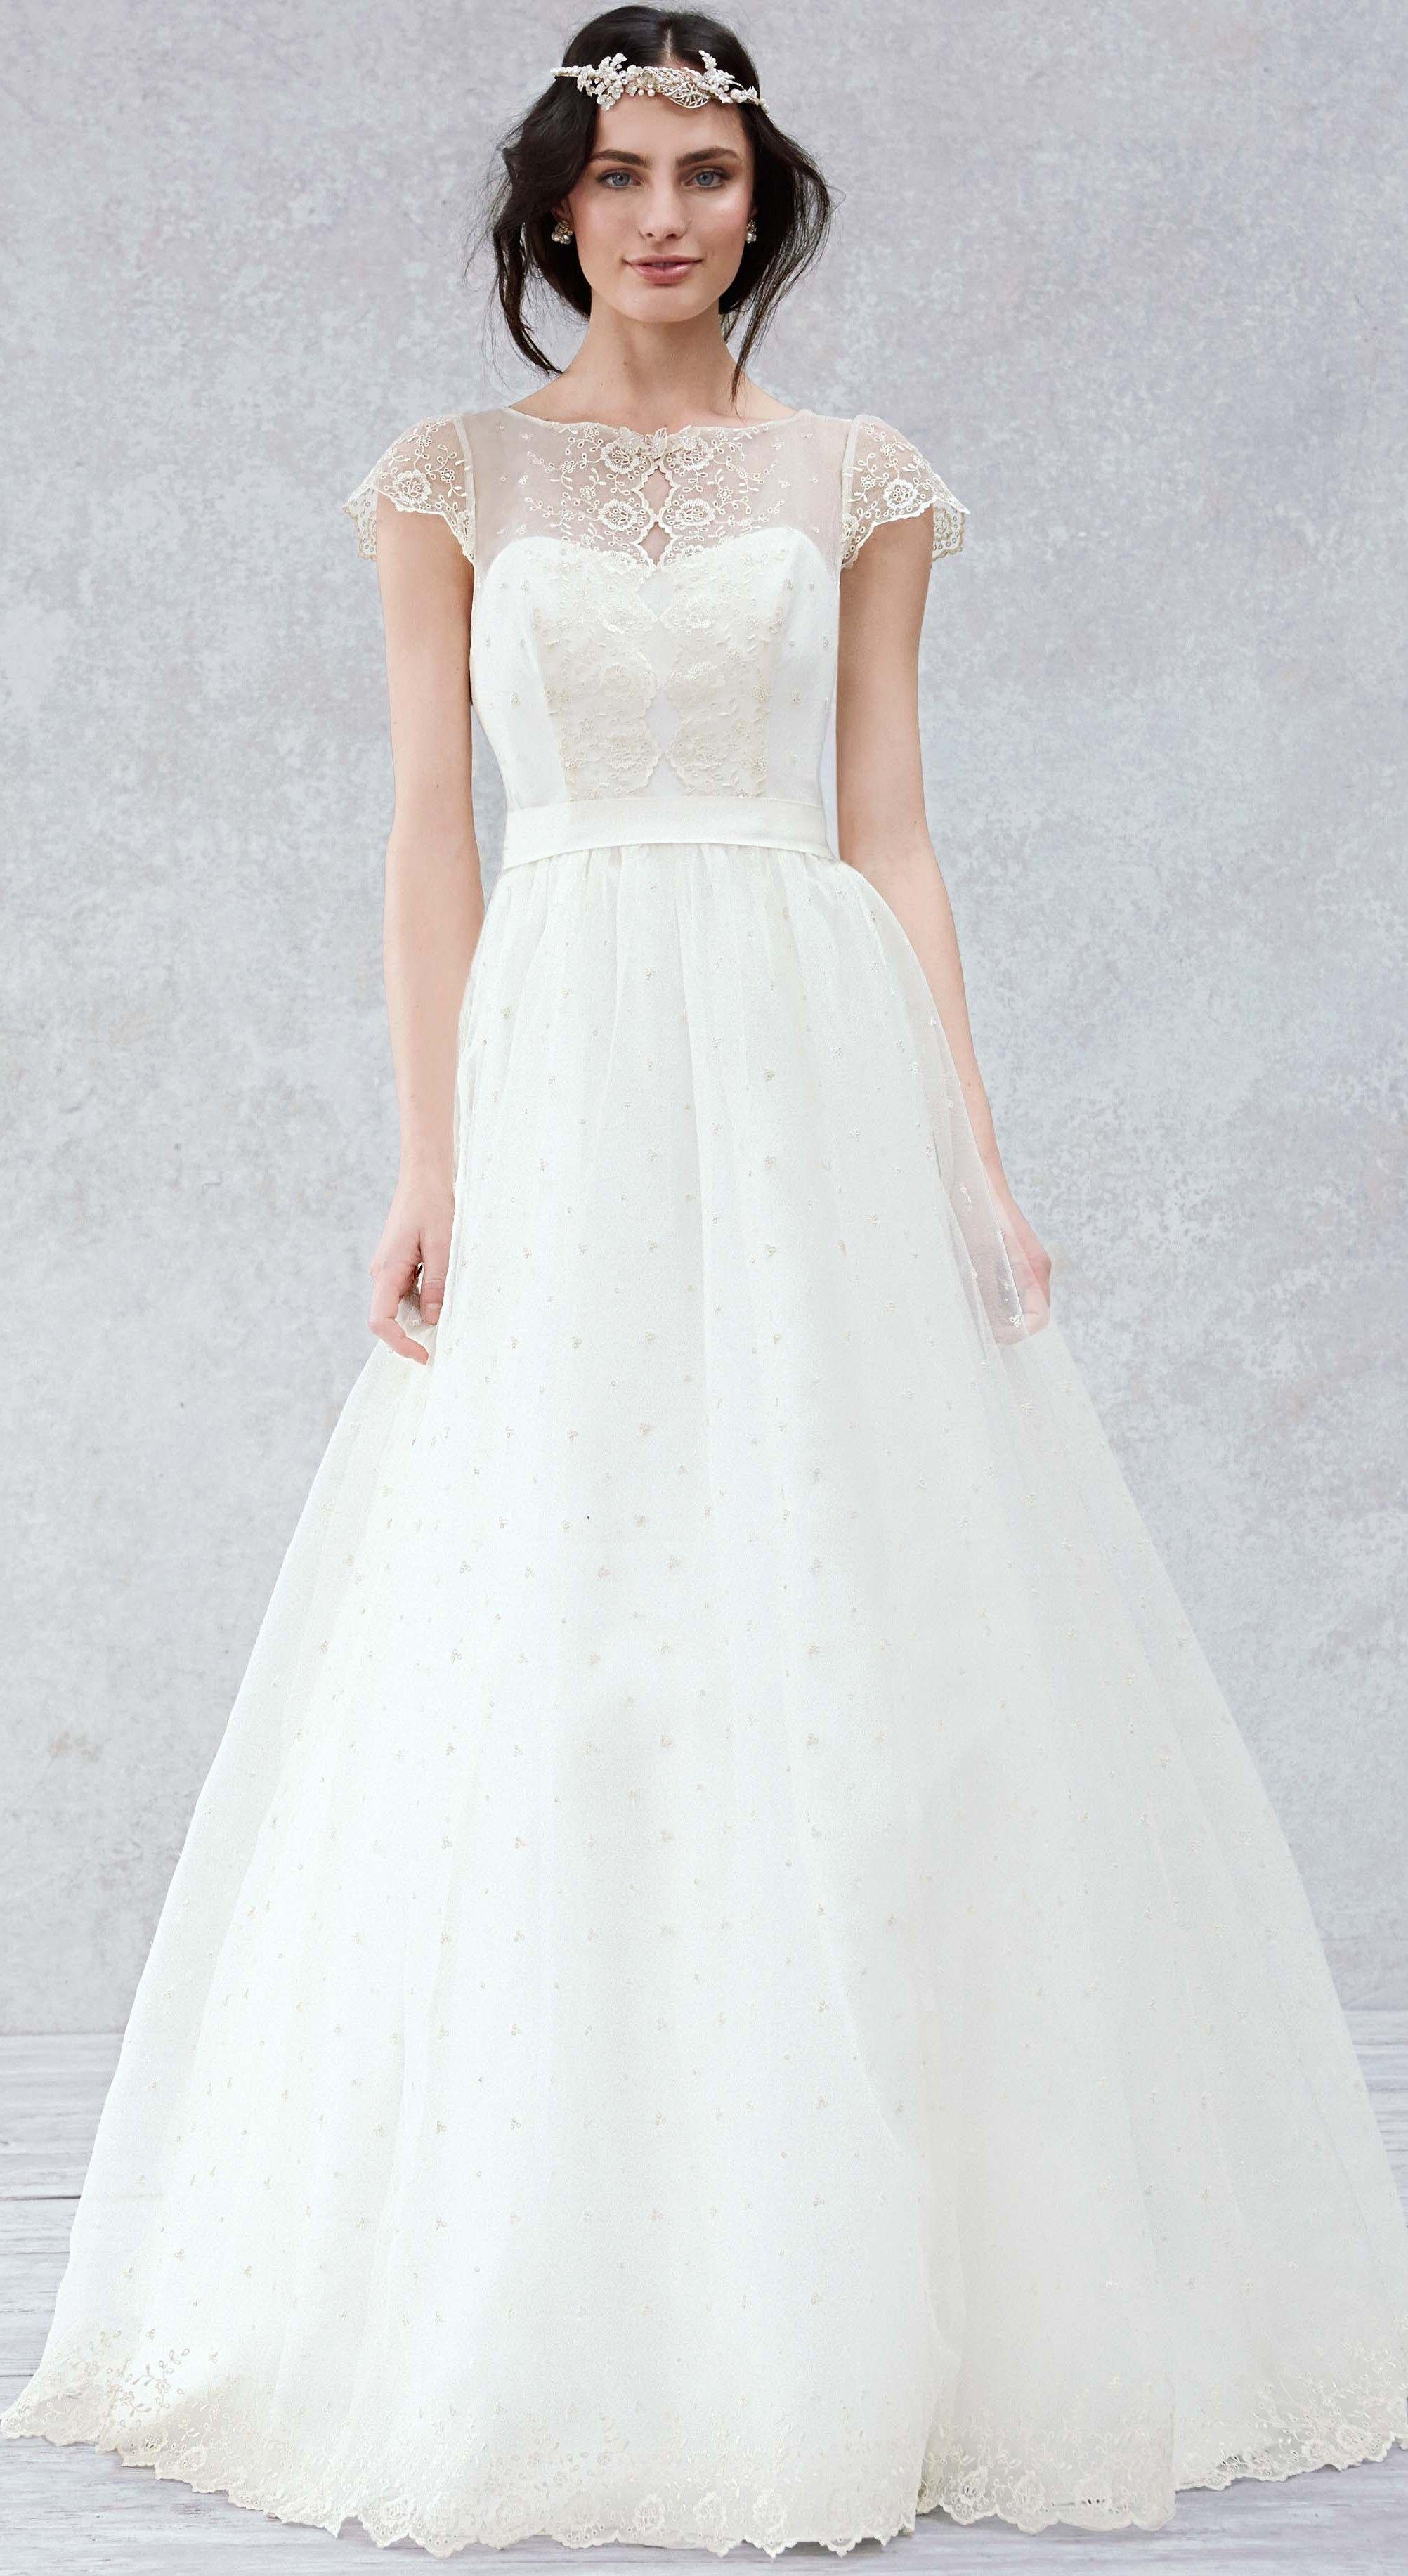 Wedding Photography Under 500: Pin On HIPPIE Wedding Dresses: Boho Style